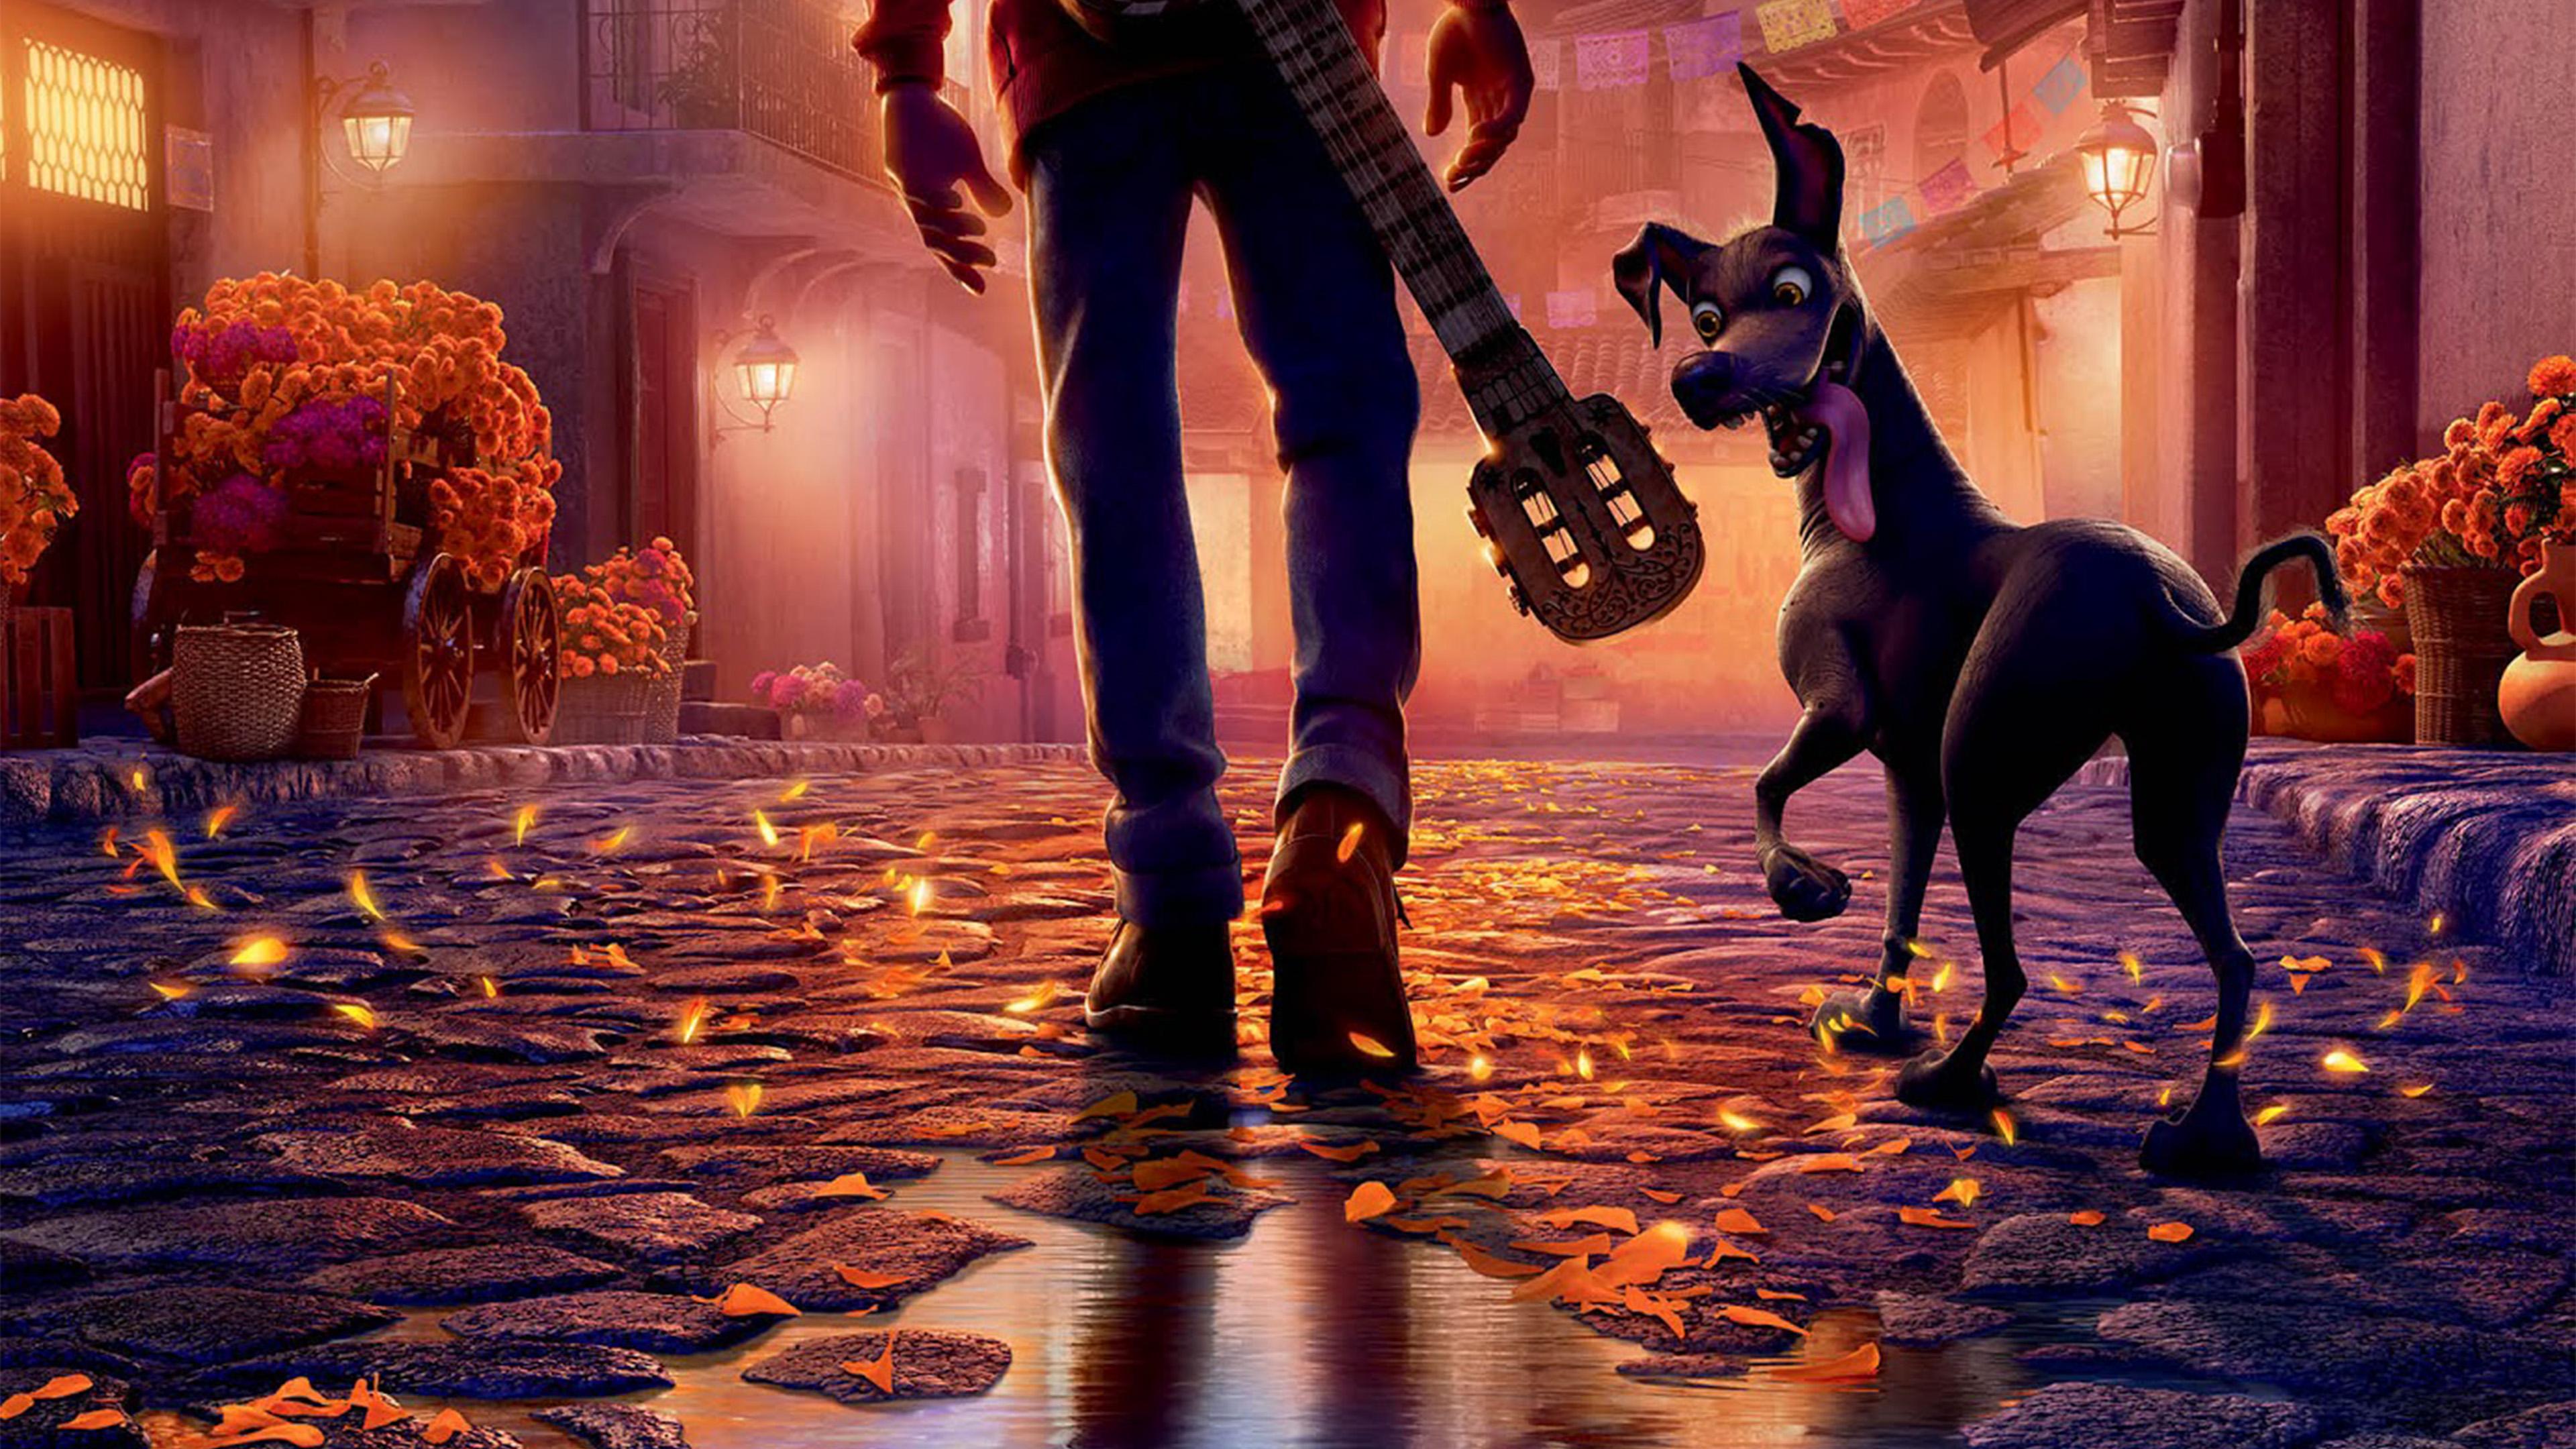 Bd50 Disney Pixar Coco Filme Anime Art Illustration Wallpaper